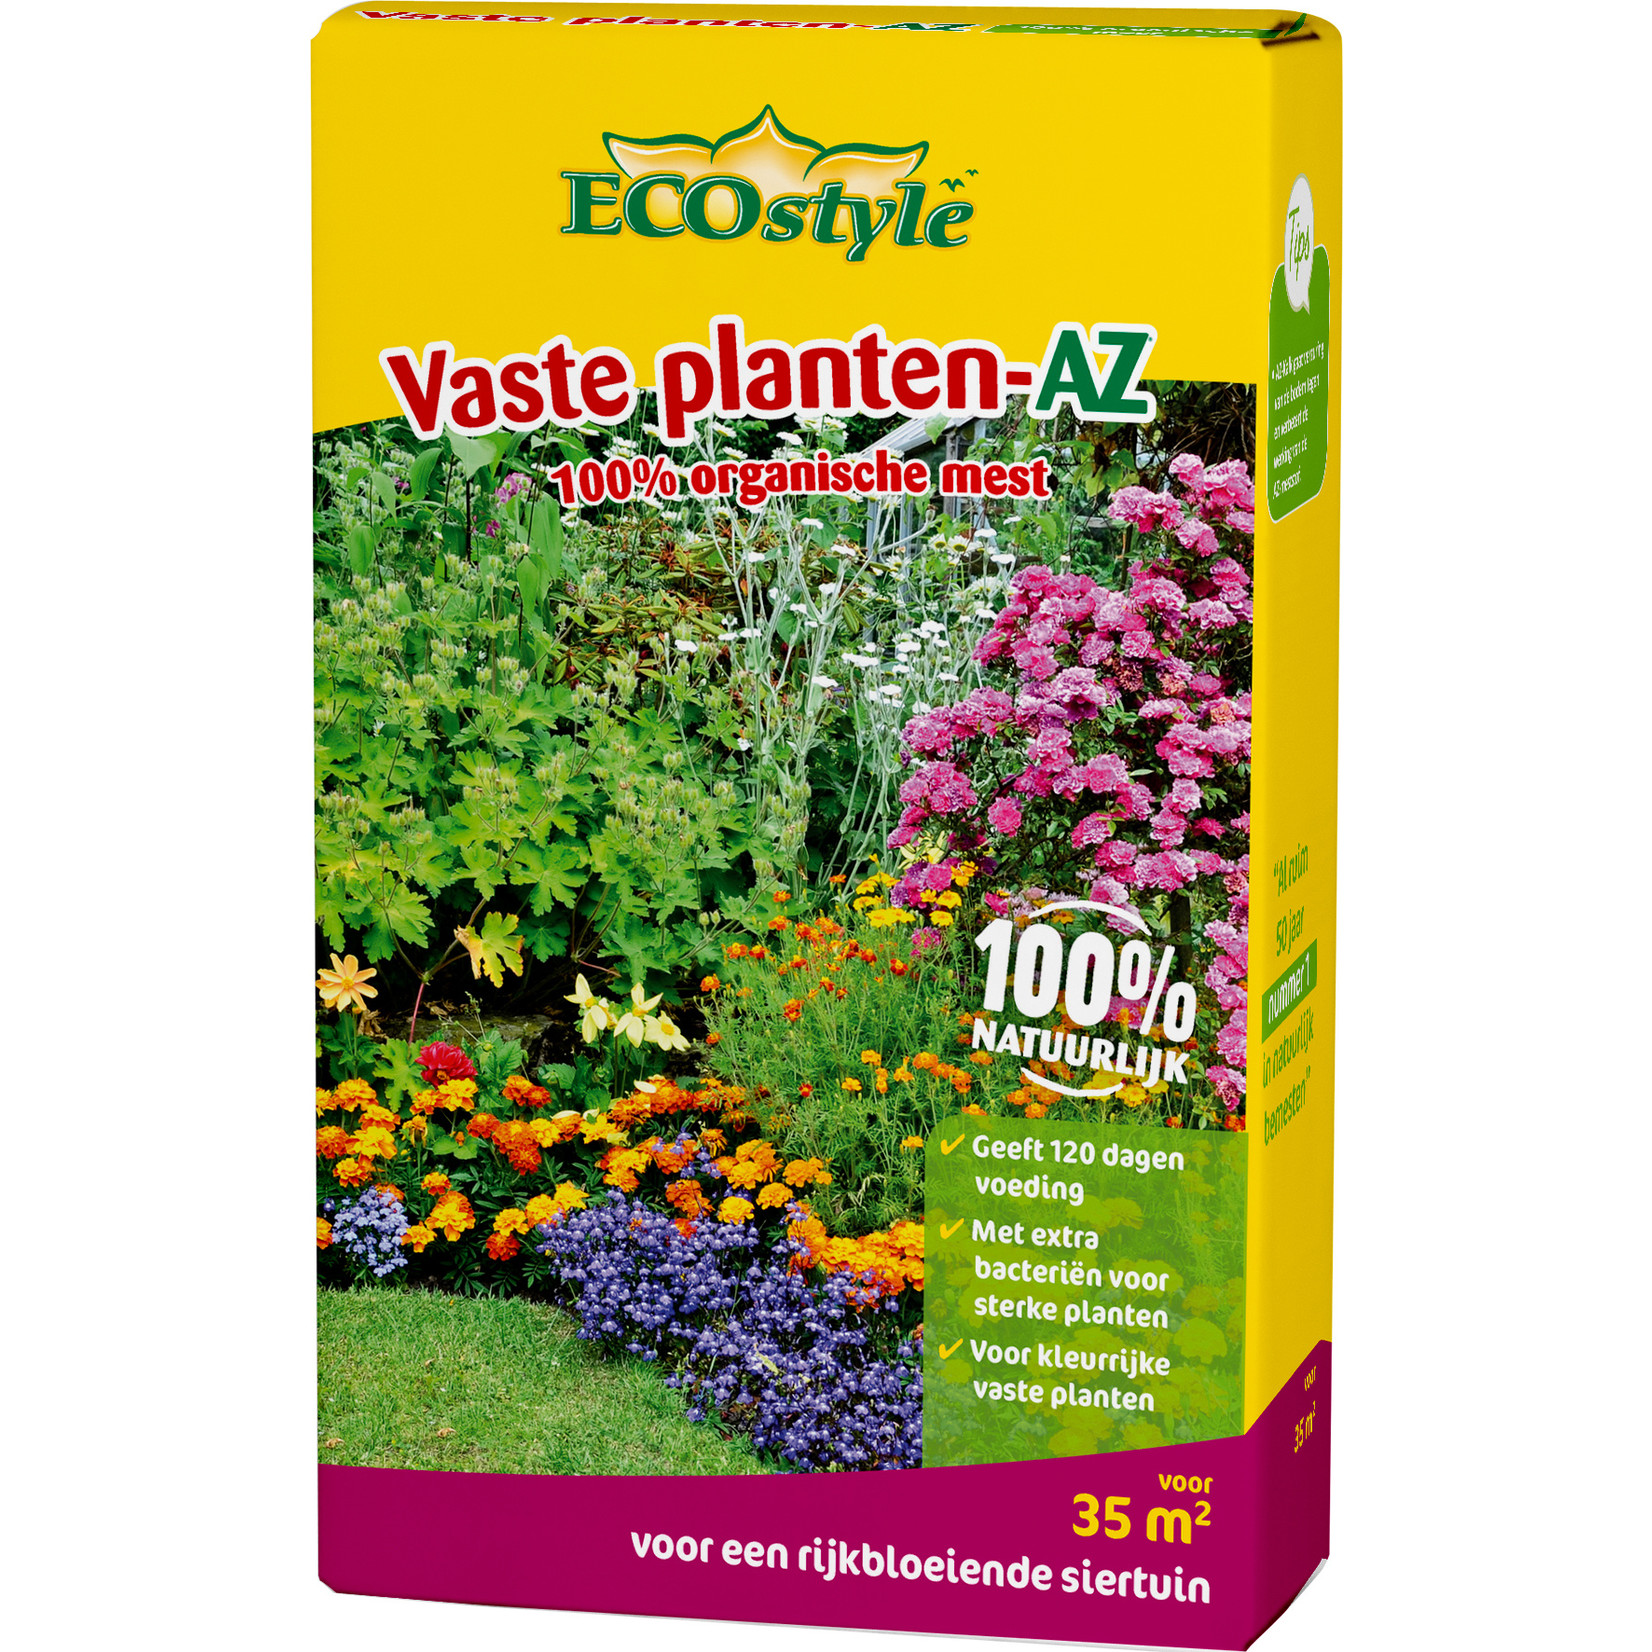 Ecostyle Vaste planten-AZ 2,75 kg meststof (35 m²)